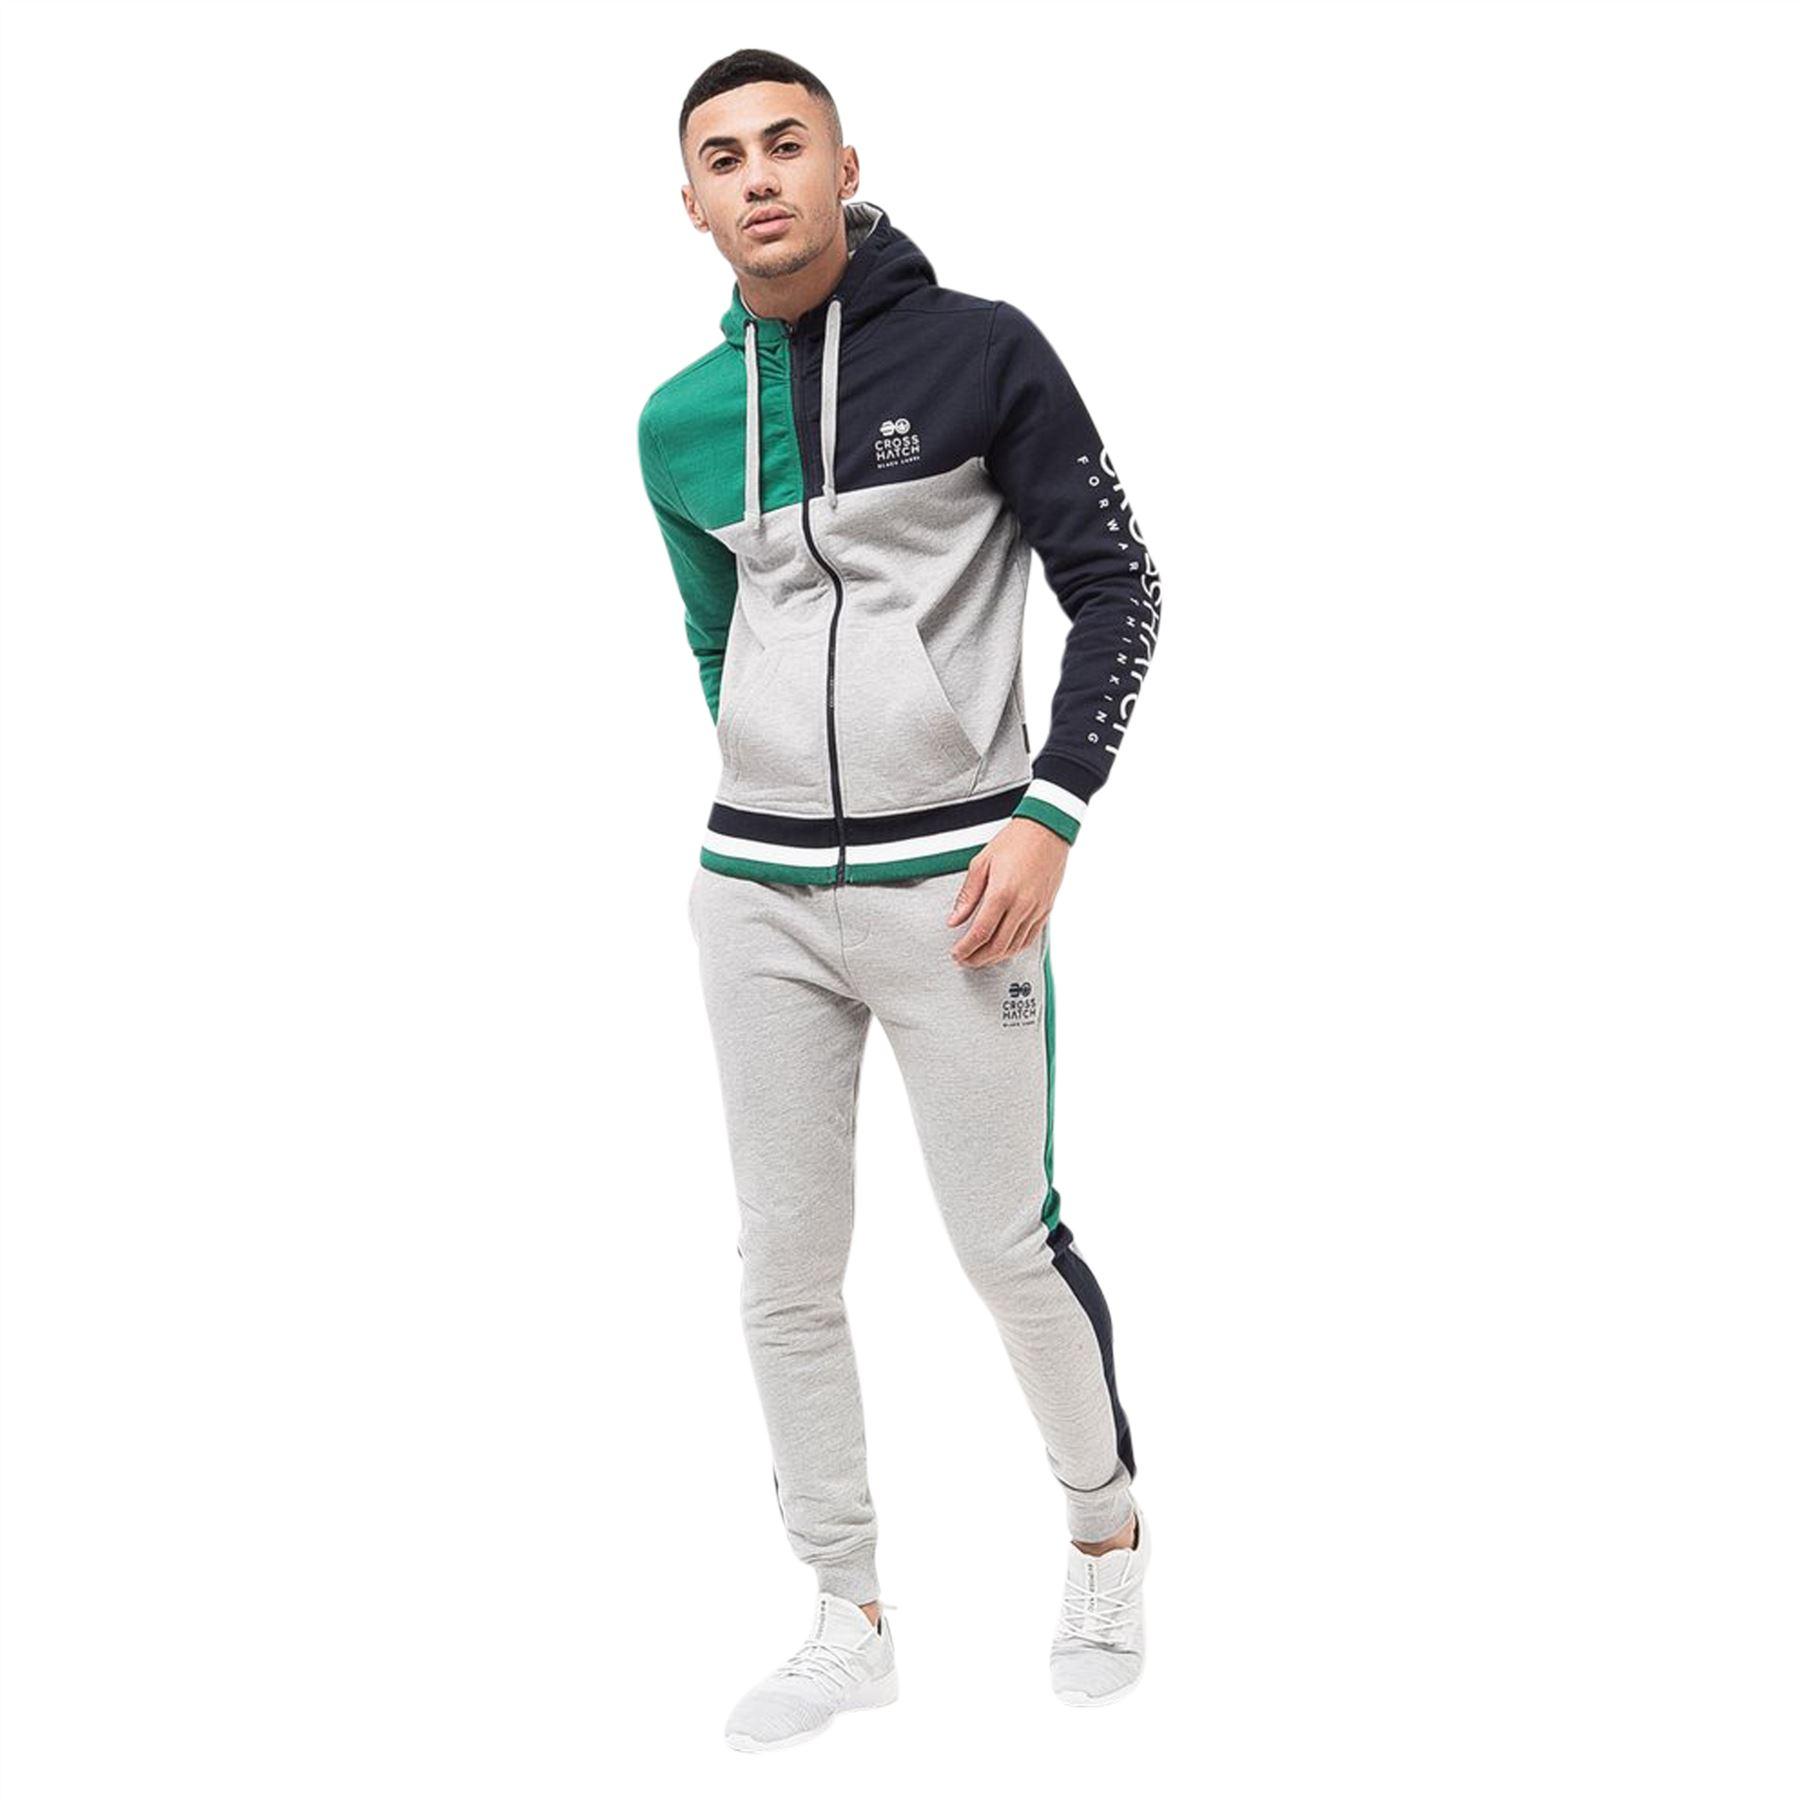 Mens-Joggers-Pants-Crosshatch-Daglum-Tracksuit-Jogging-Trousers thumbnail 4